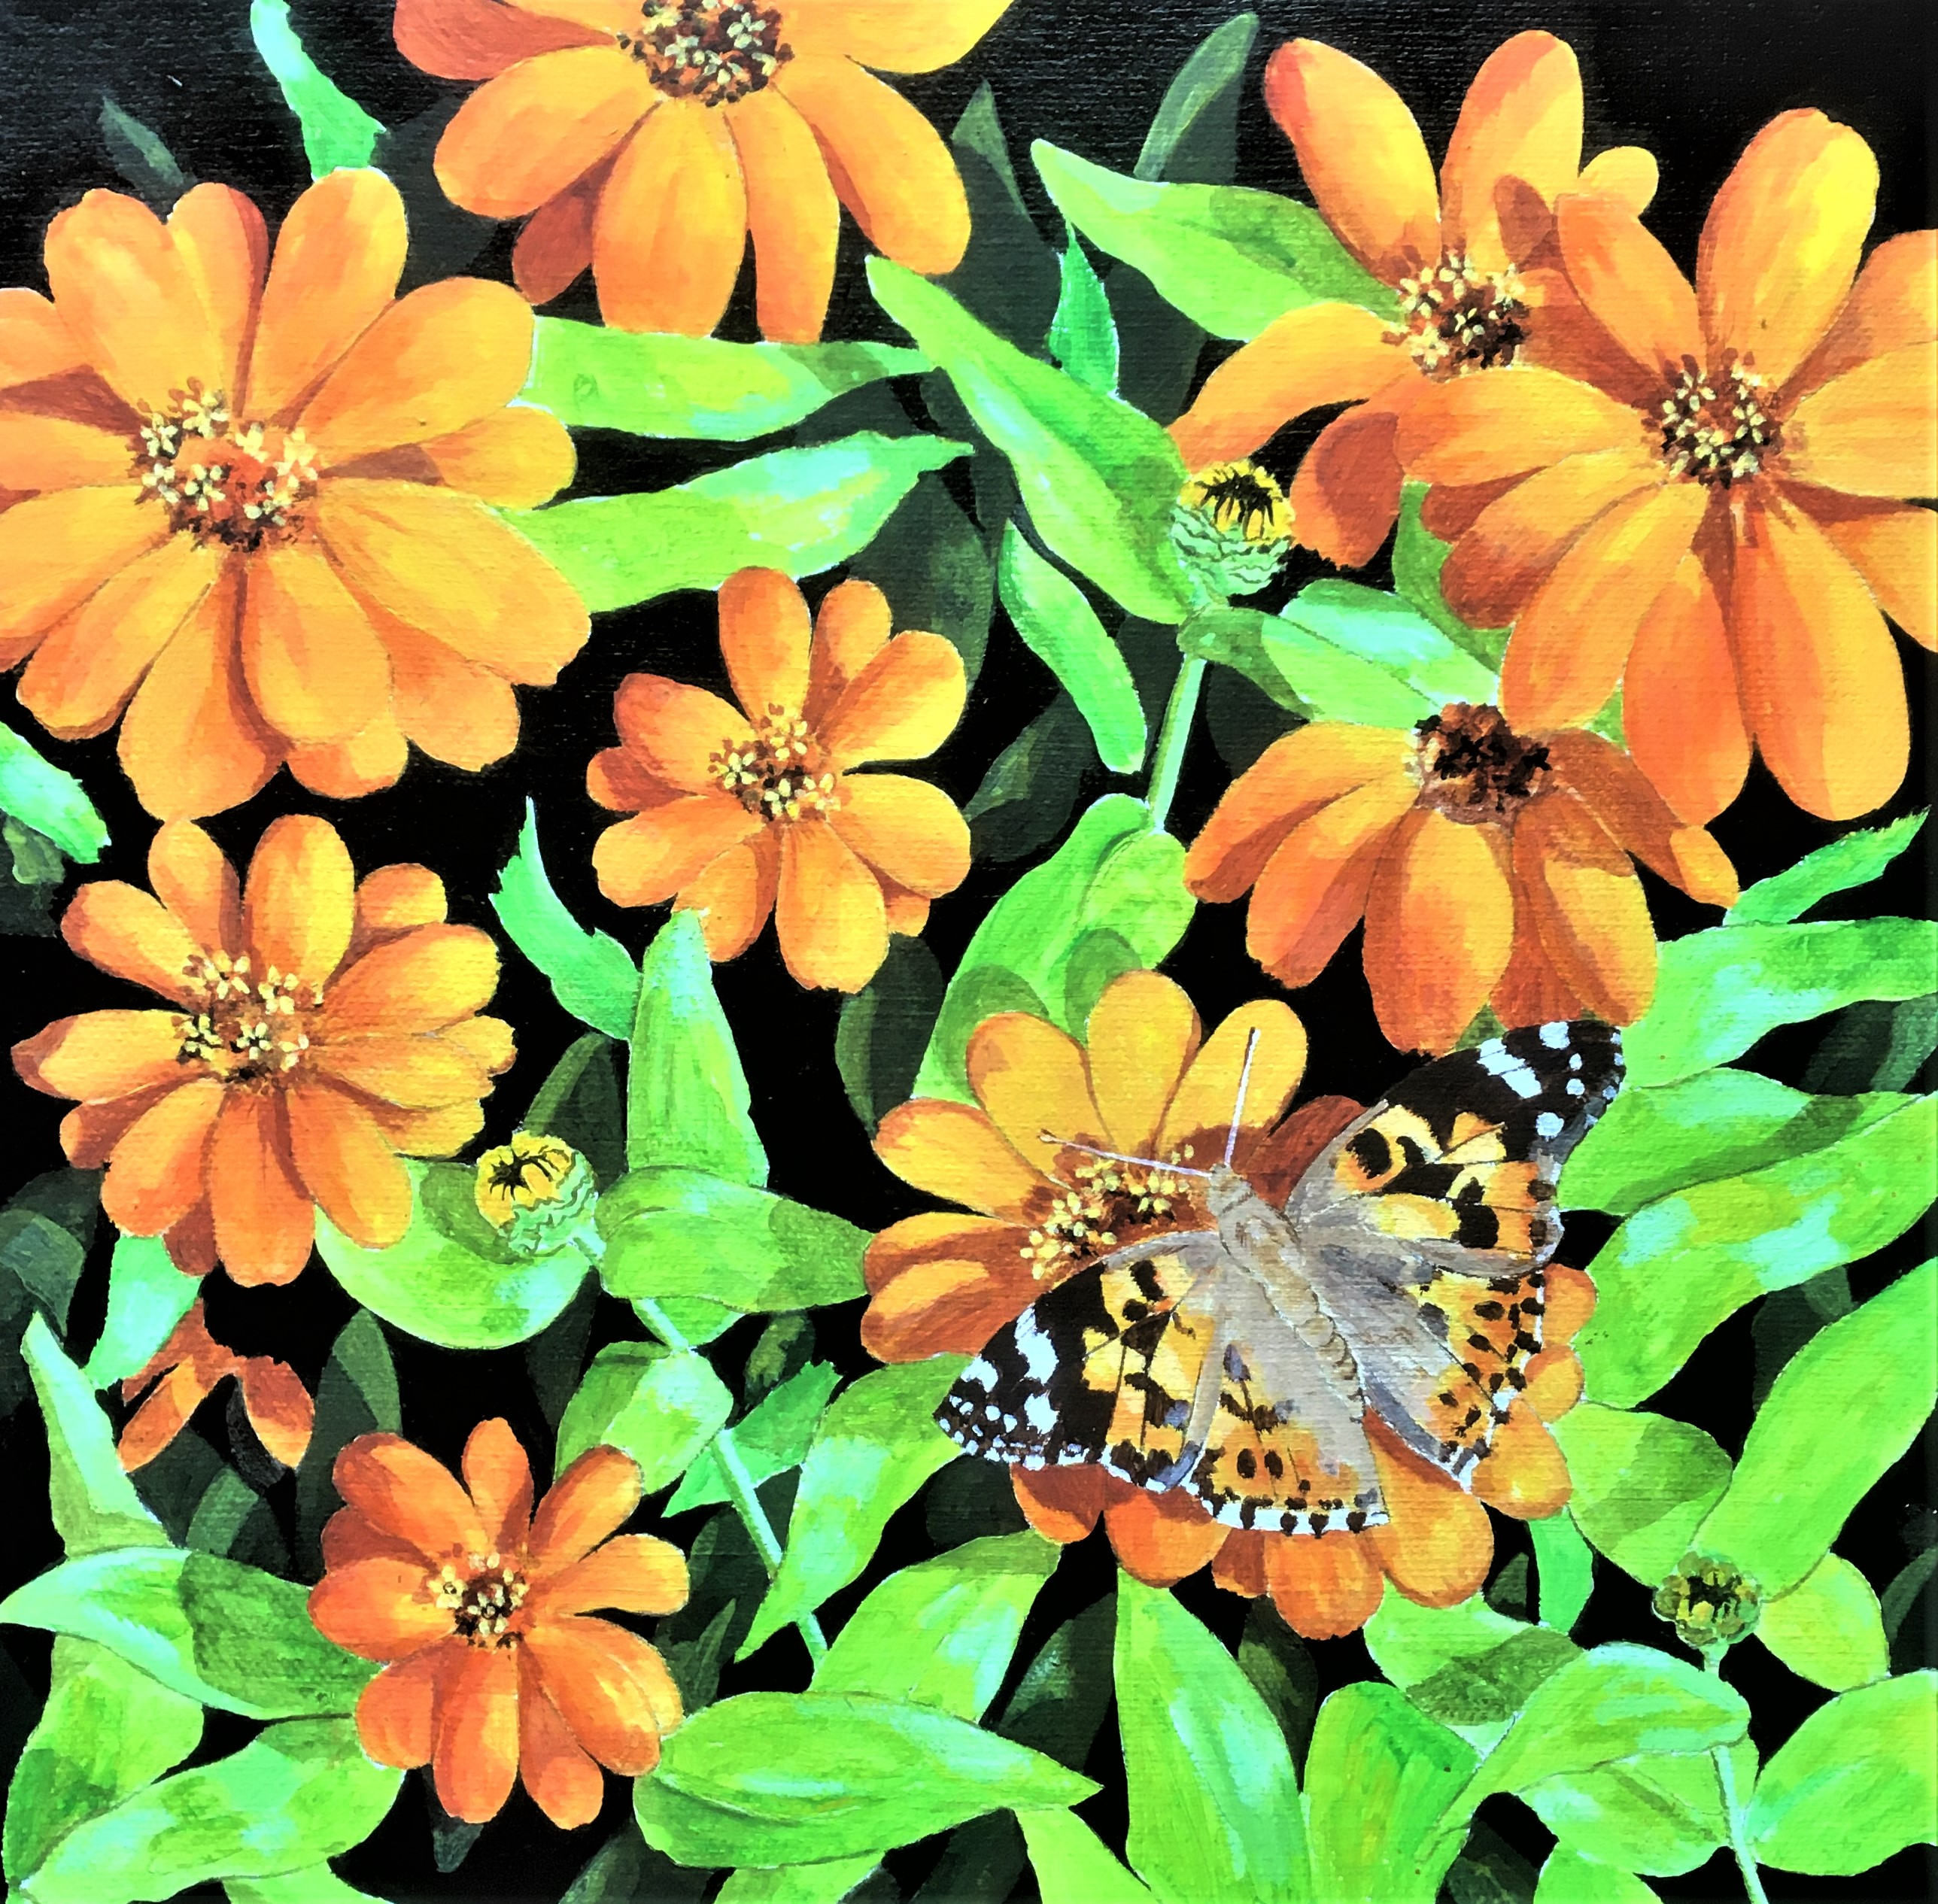 Zingy Summer Colour 12x12 acrylic